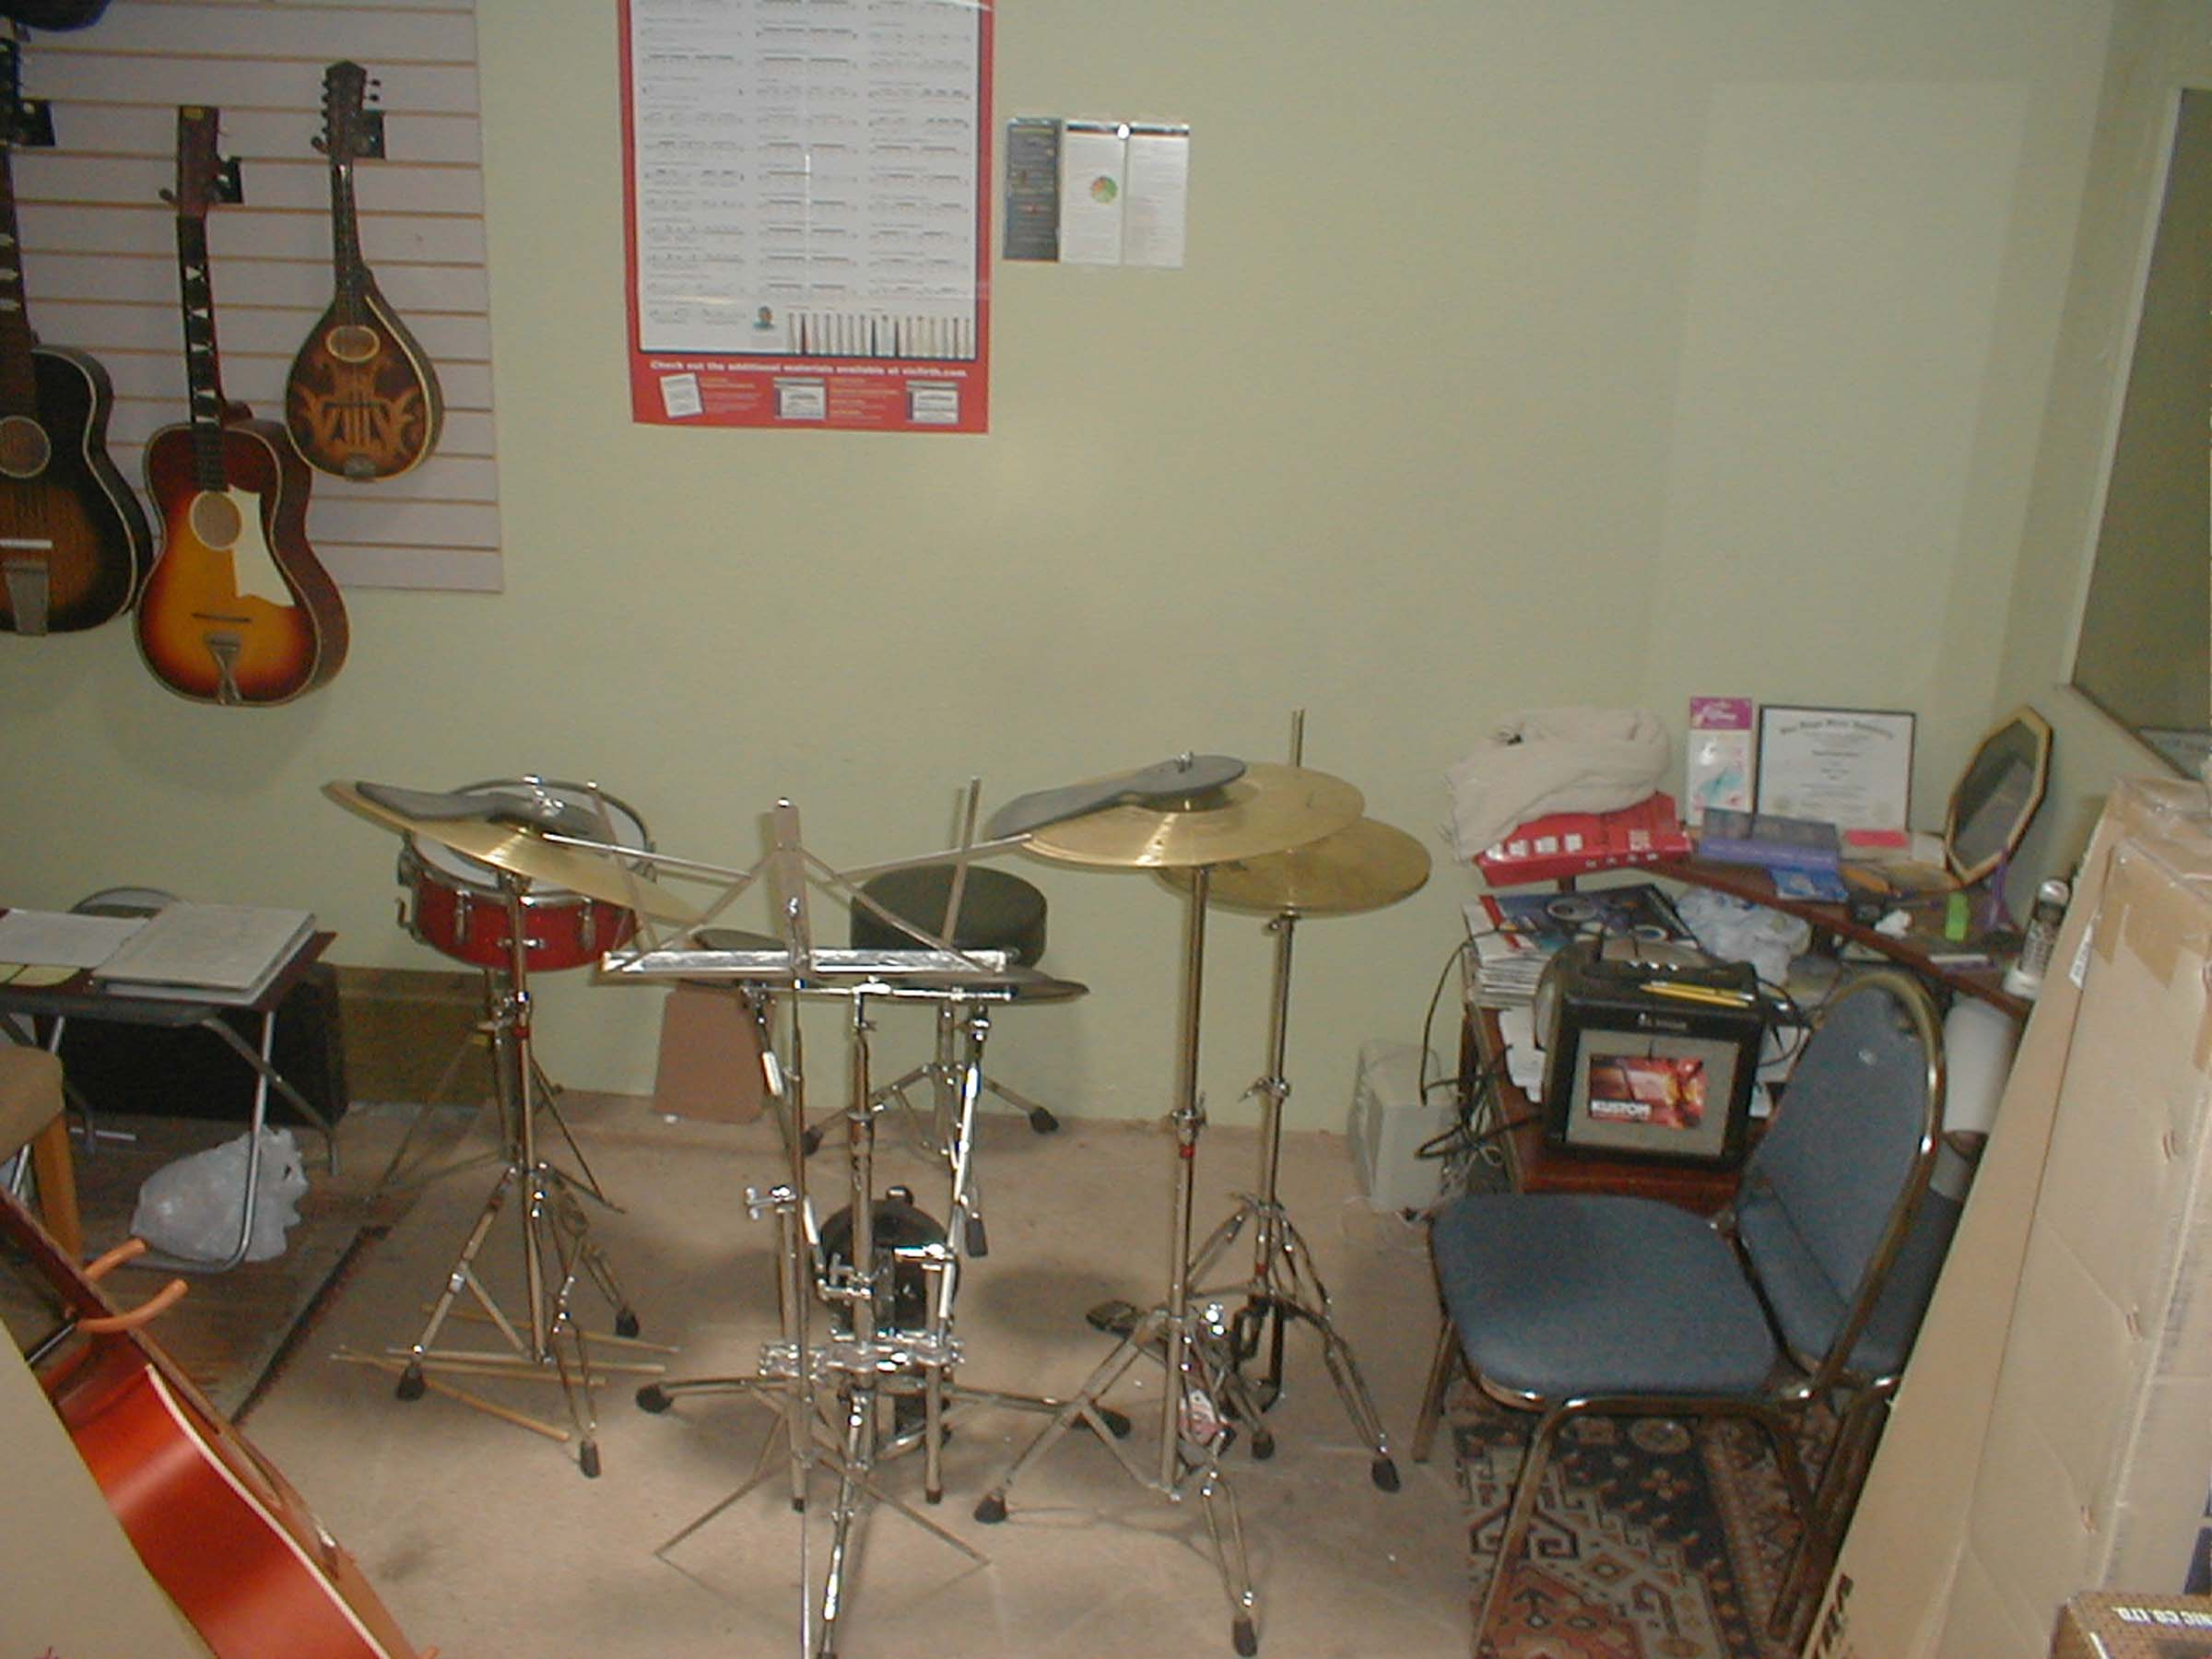 2005 Drum teaching area @ Mike Fenton's MuzikMuzik store, El Cajon CA